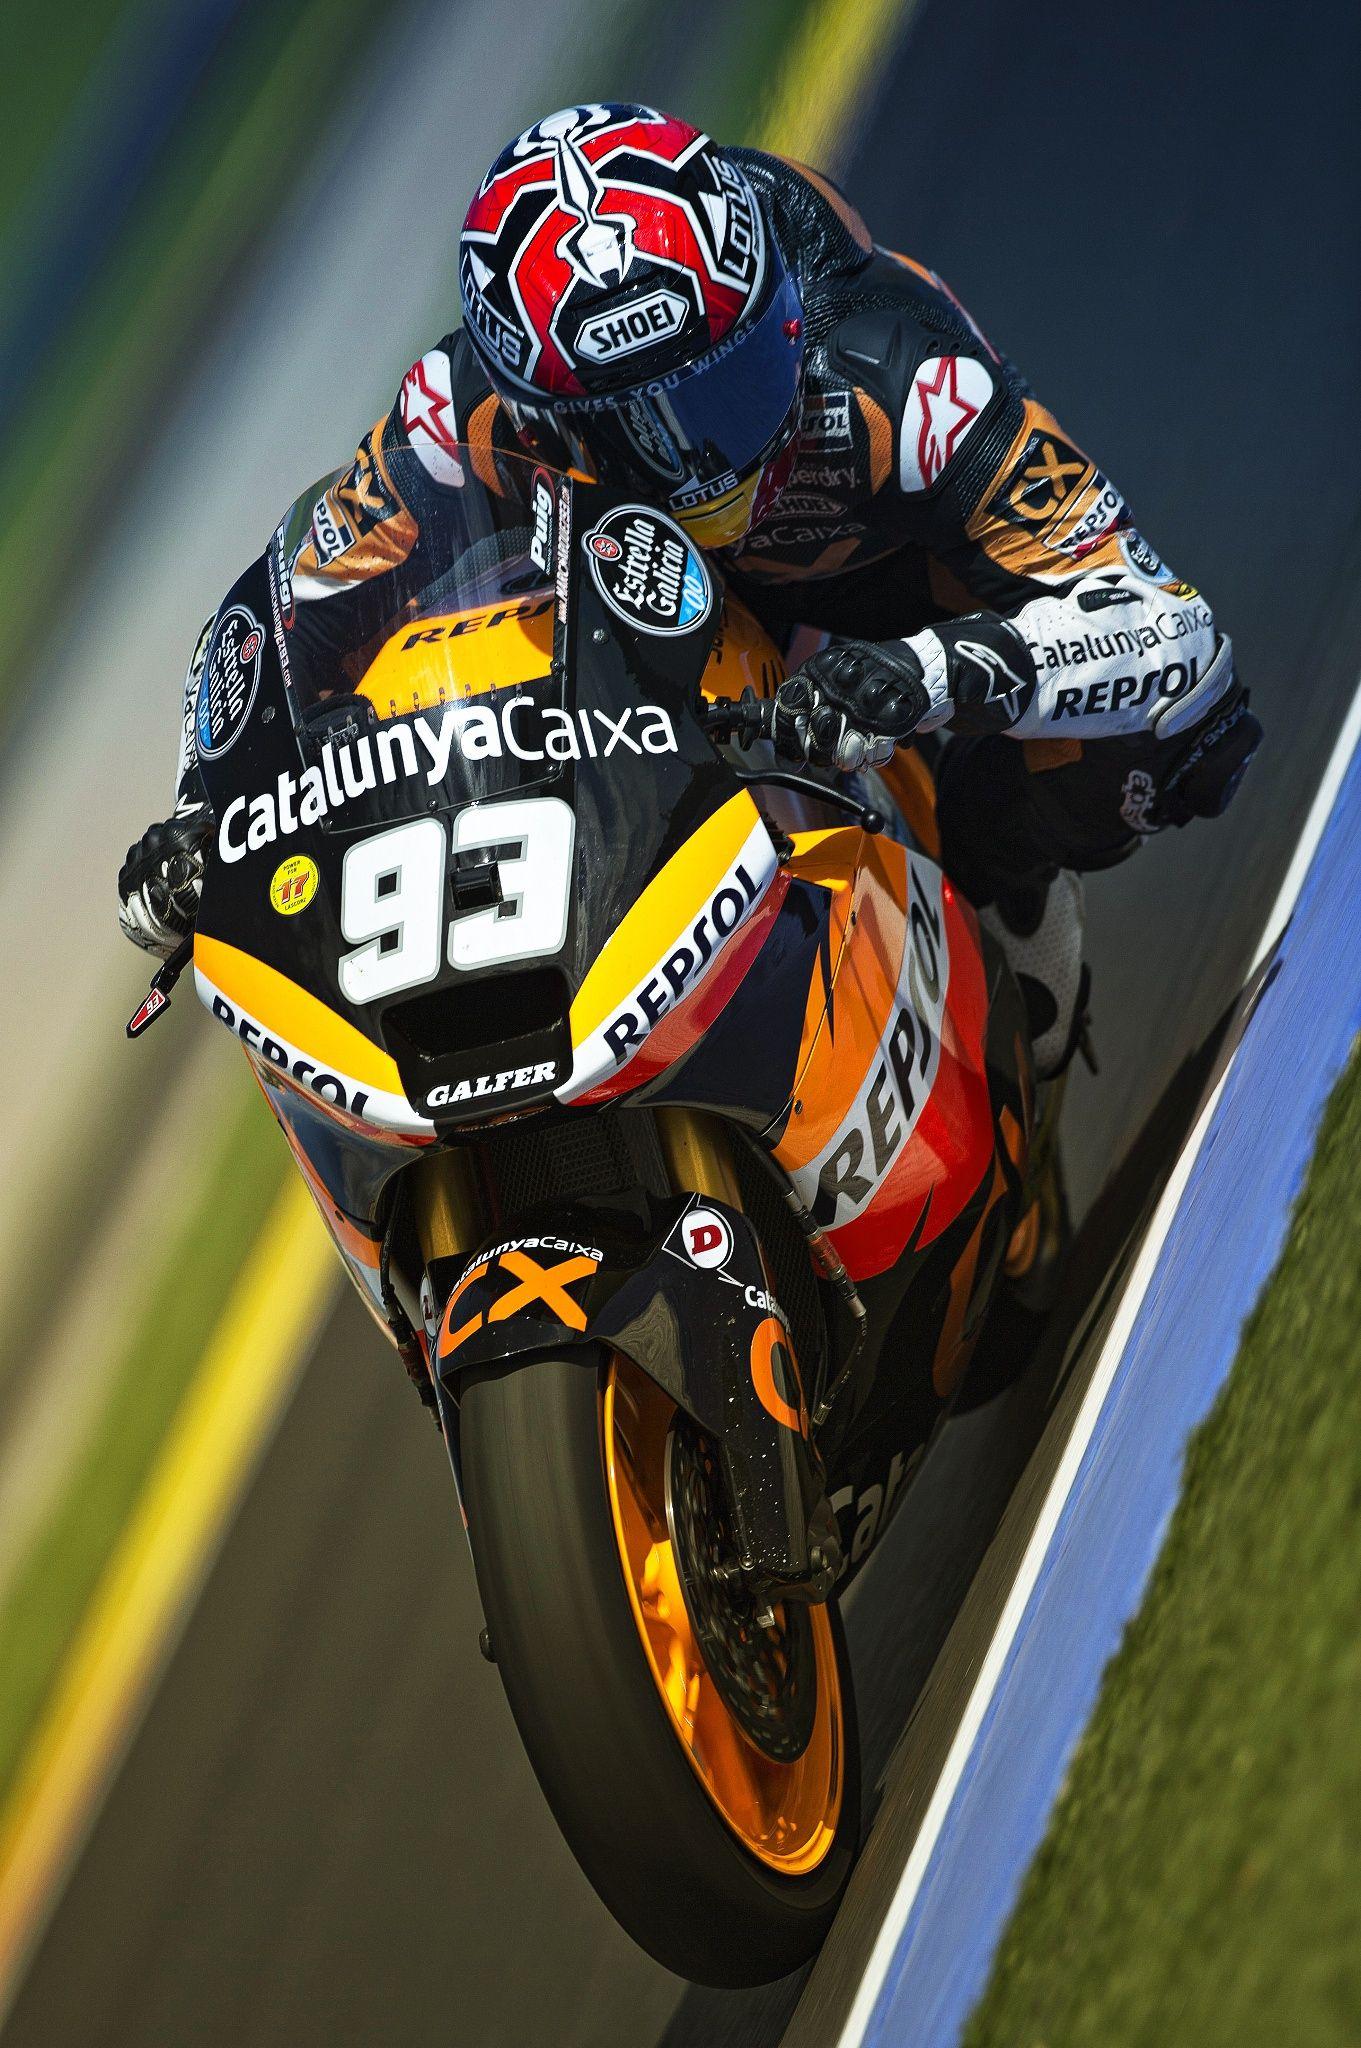 Moto2 World Champion 2012 In 2020 Marc Marquez Motogp Racing Bikes